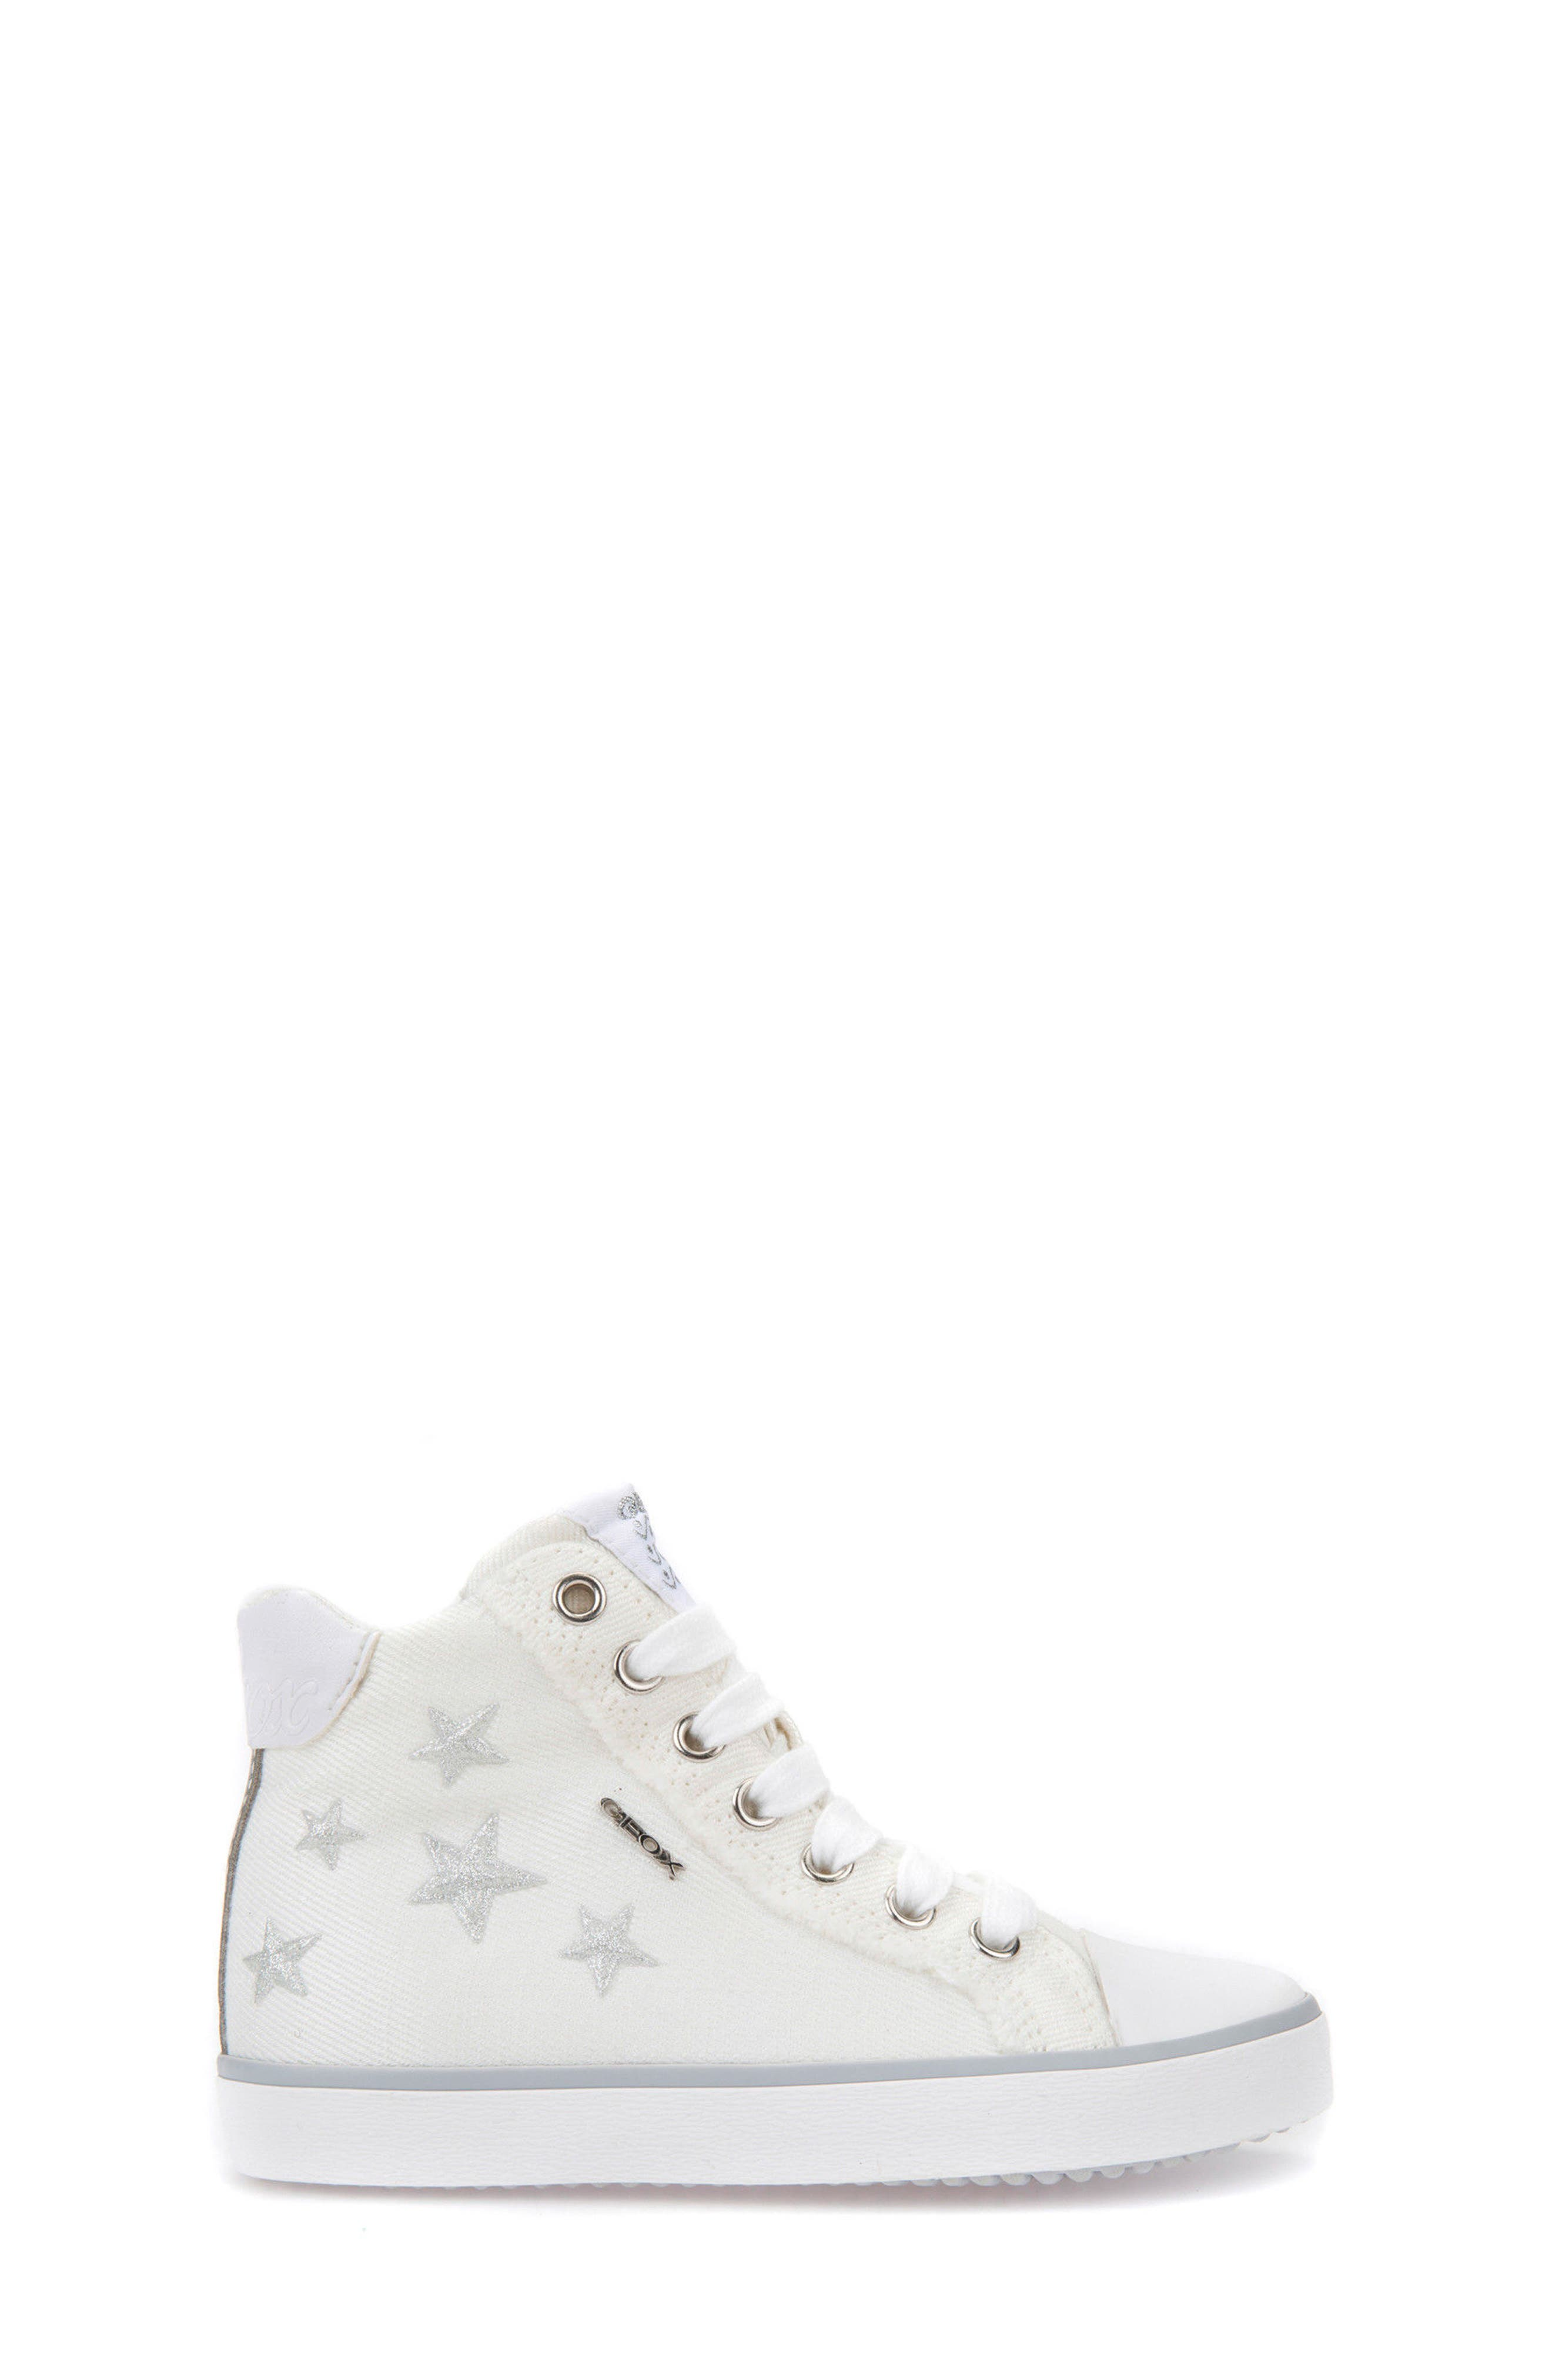 Kilwi High Top Zip Sneaker,                             Alternate thumbnail 3, color,                             WHITE